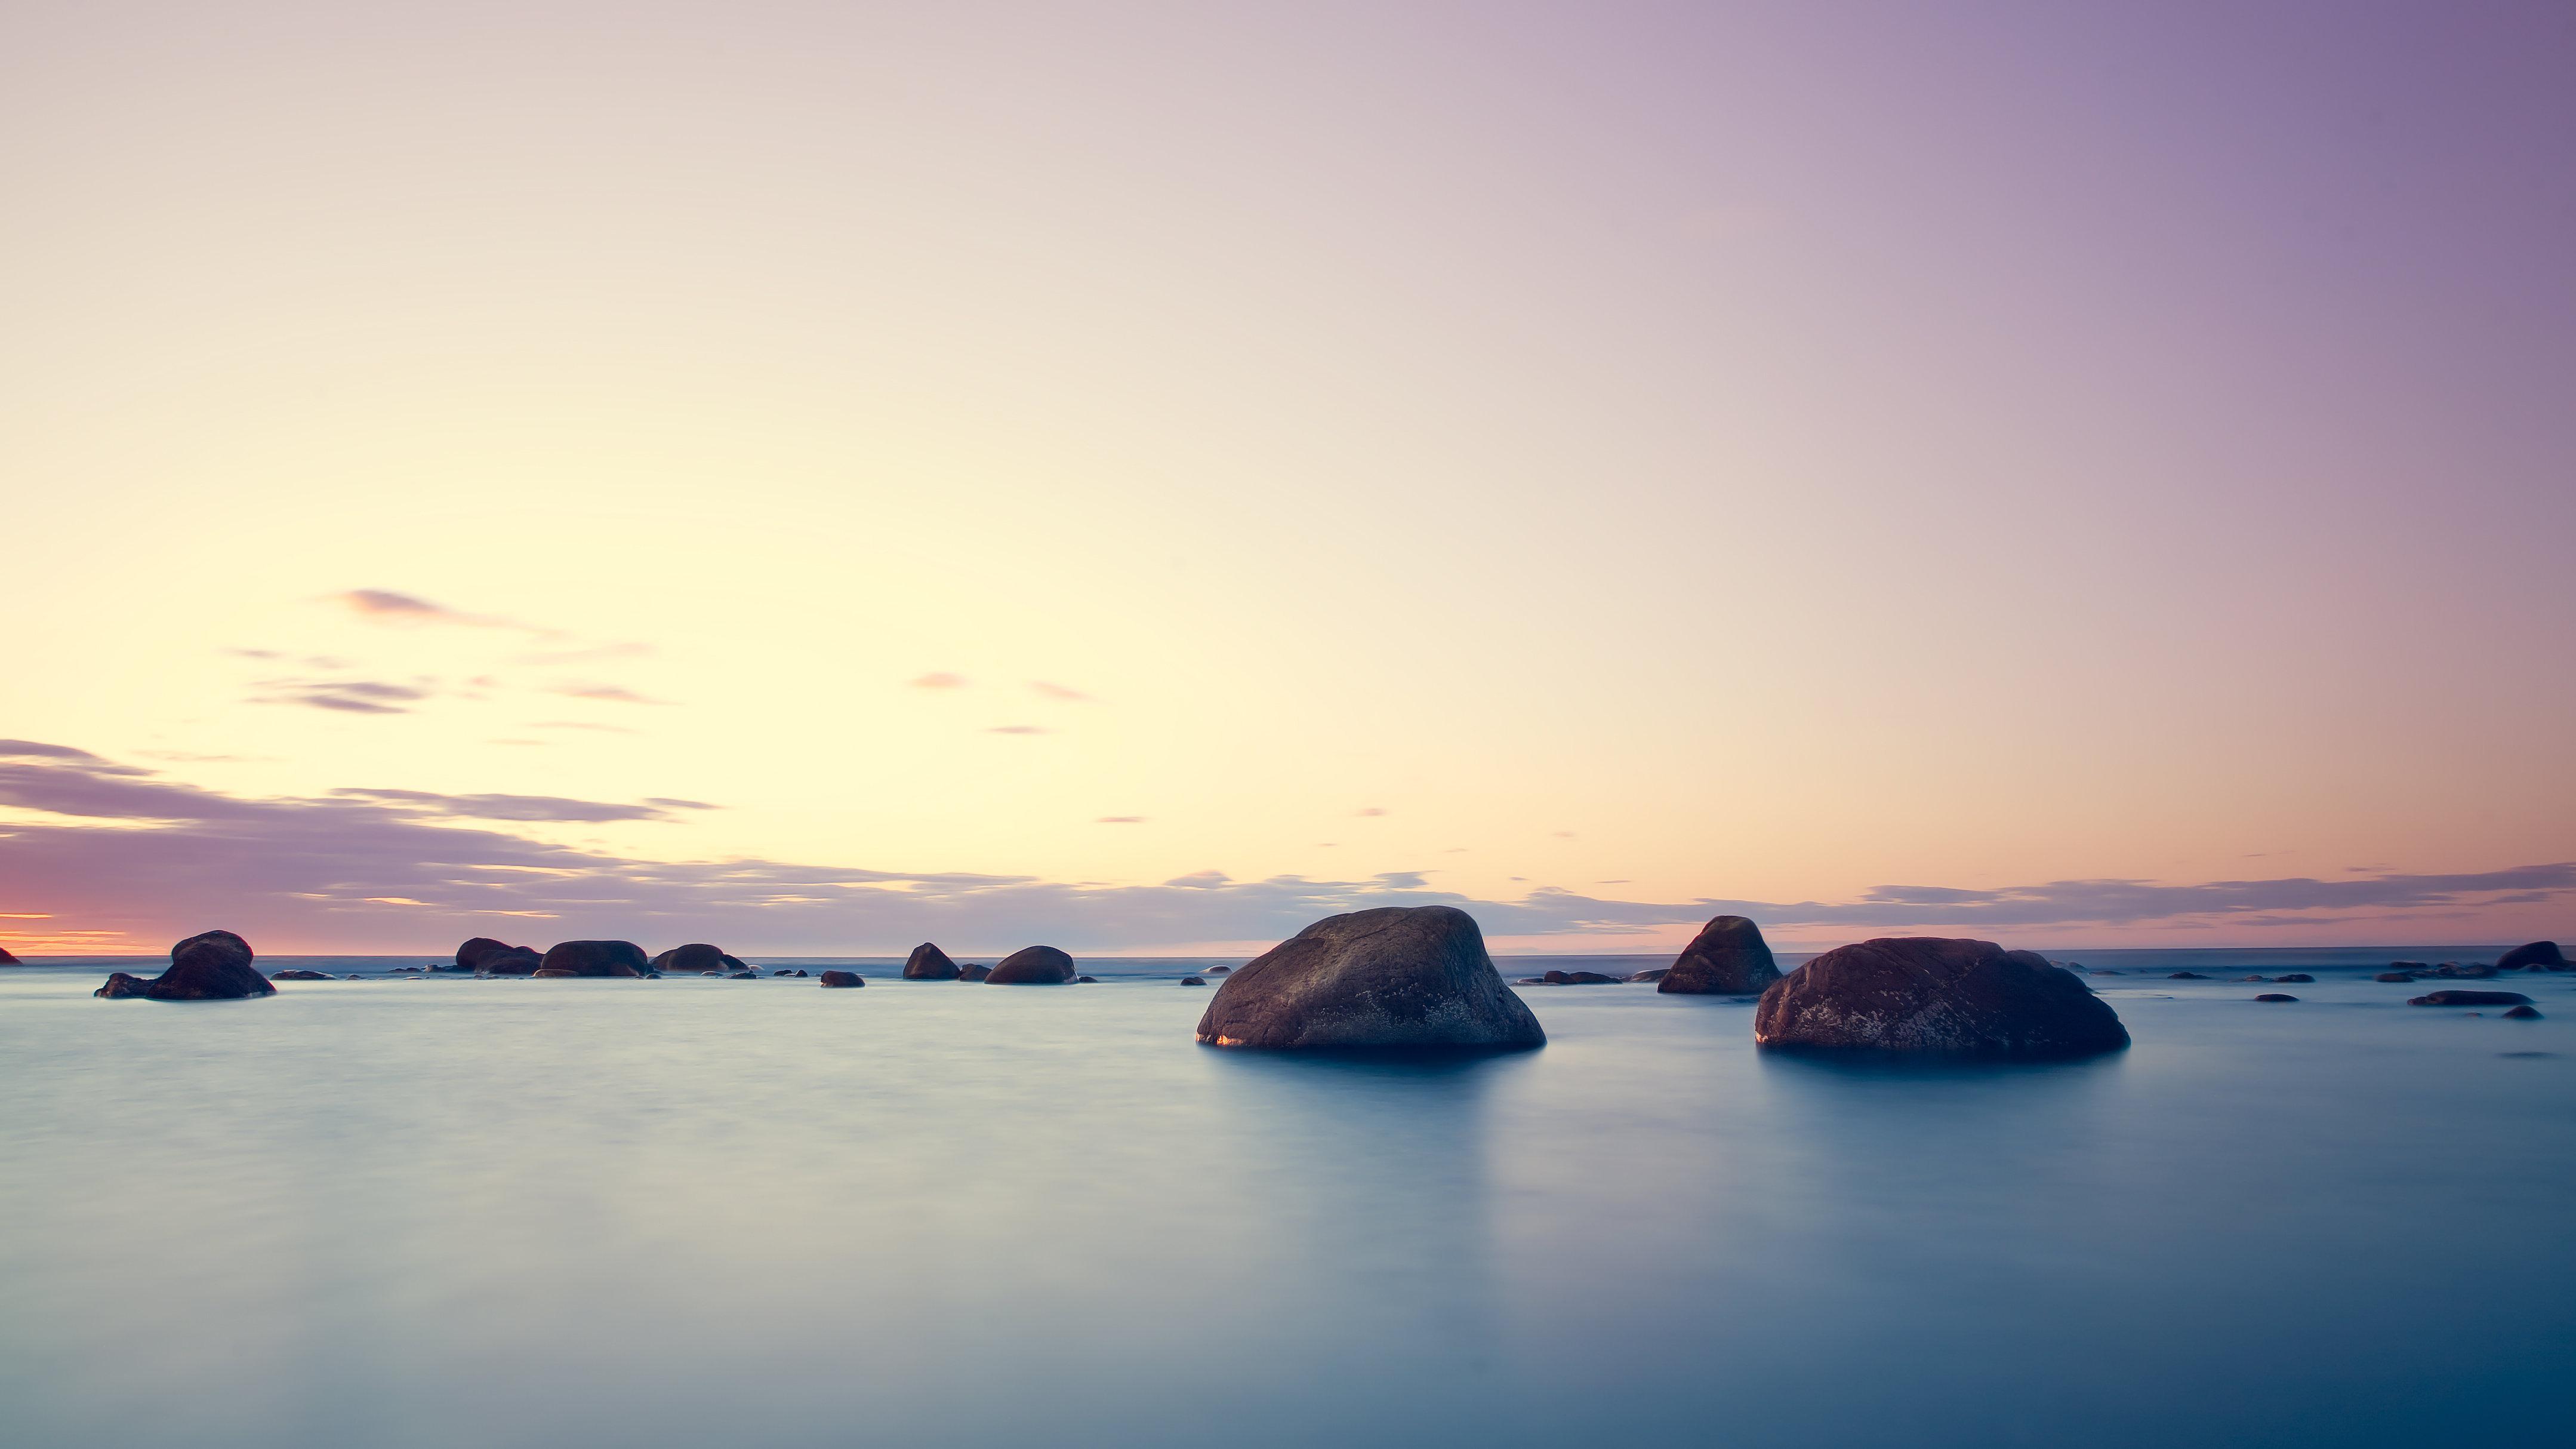 горизонт камни море вода океан природа  № 2556143  скачать